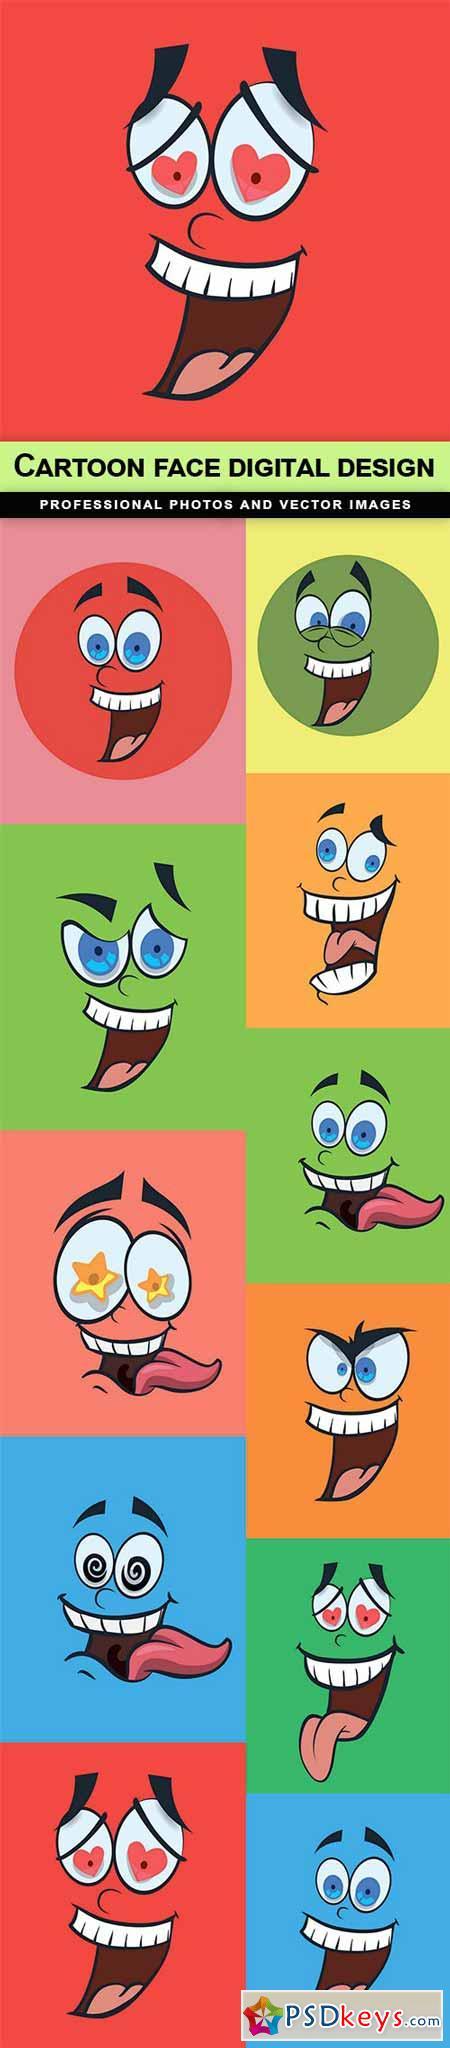 Cartoon face digital design - 11 EPS